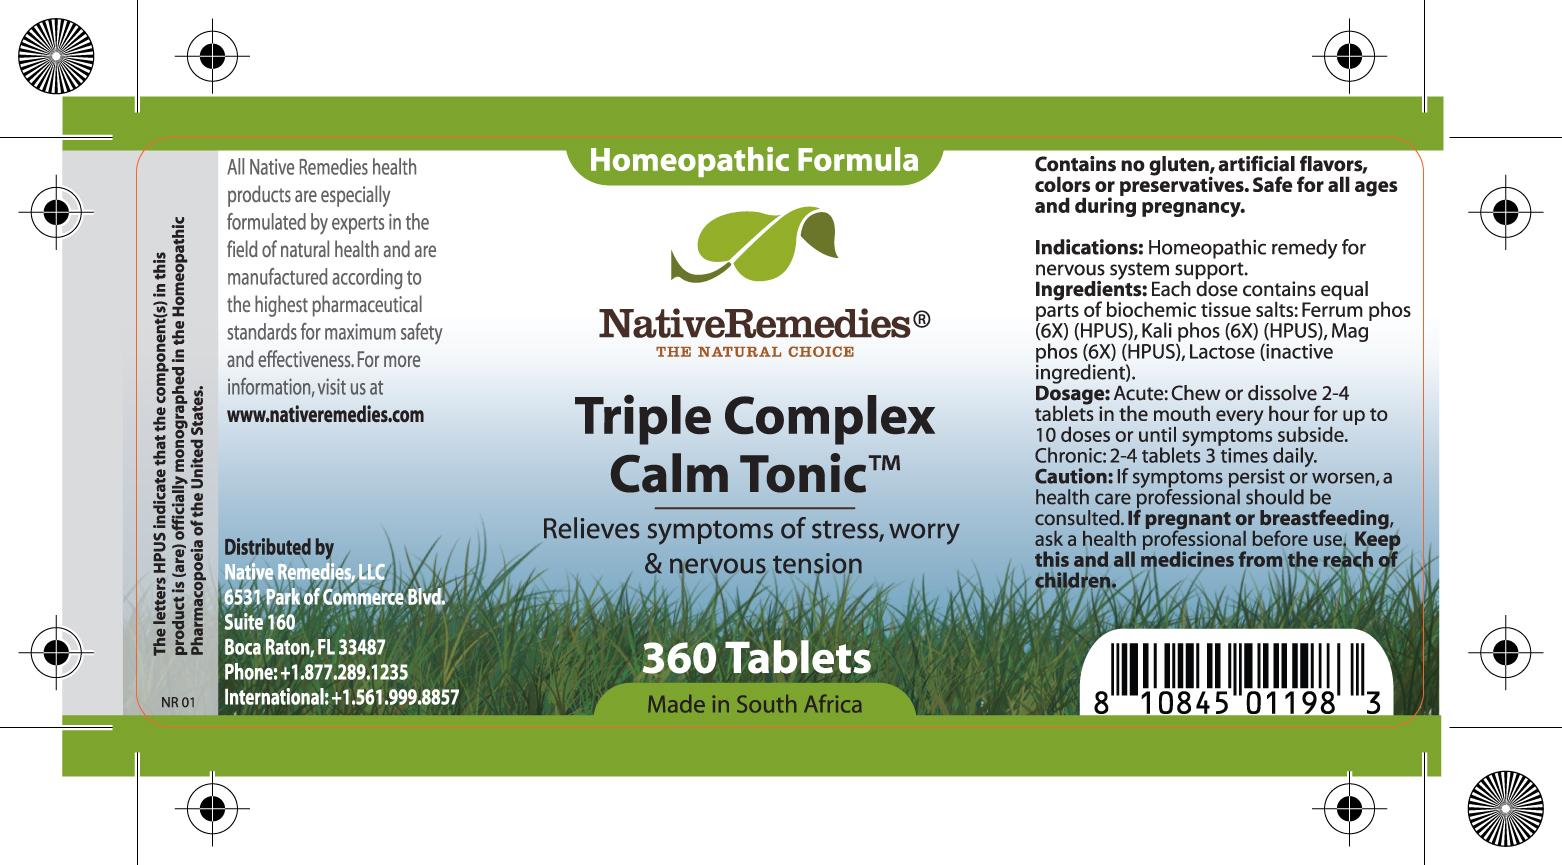 Triple Complex Calm Tonic (Ferrum Phos , Kali Phos, Mag Phos ) Tablet [Feelgood Health]